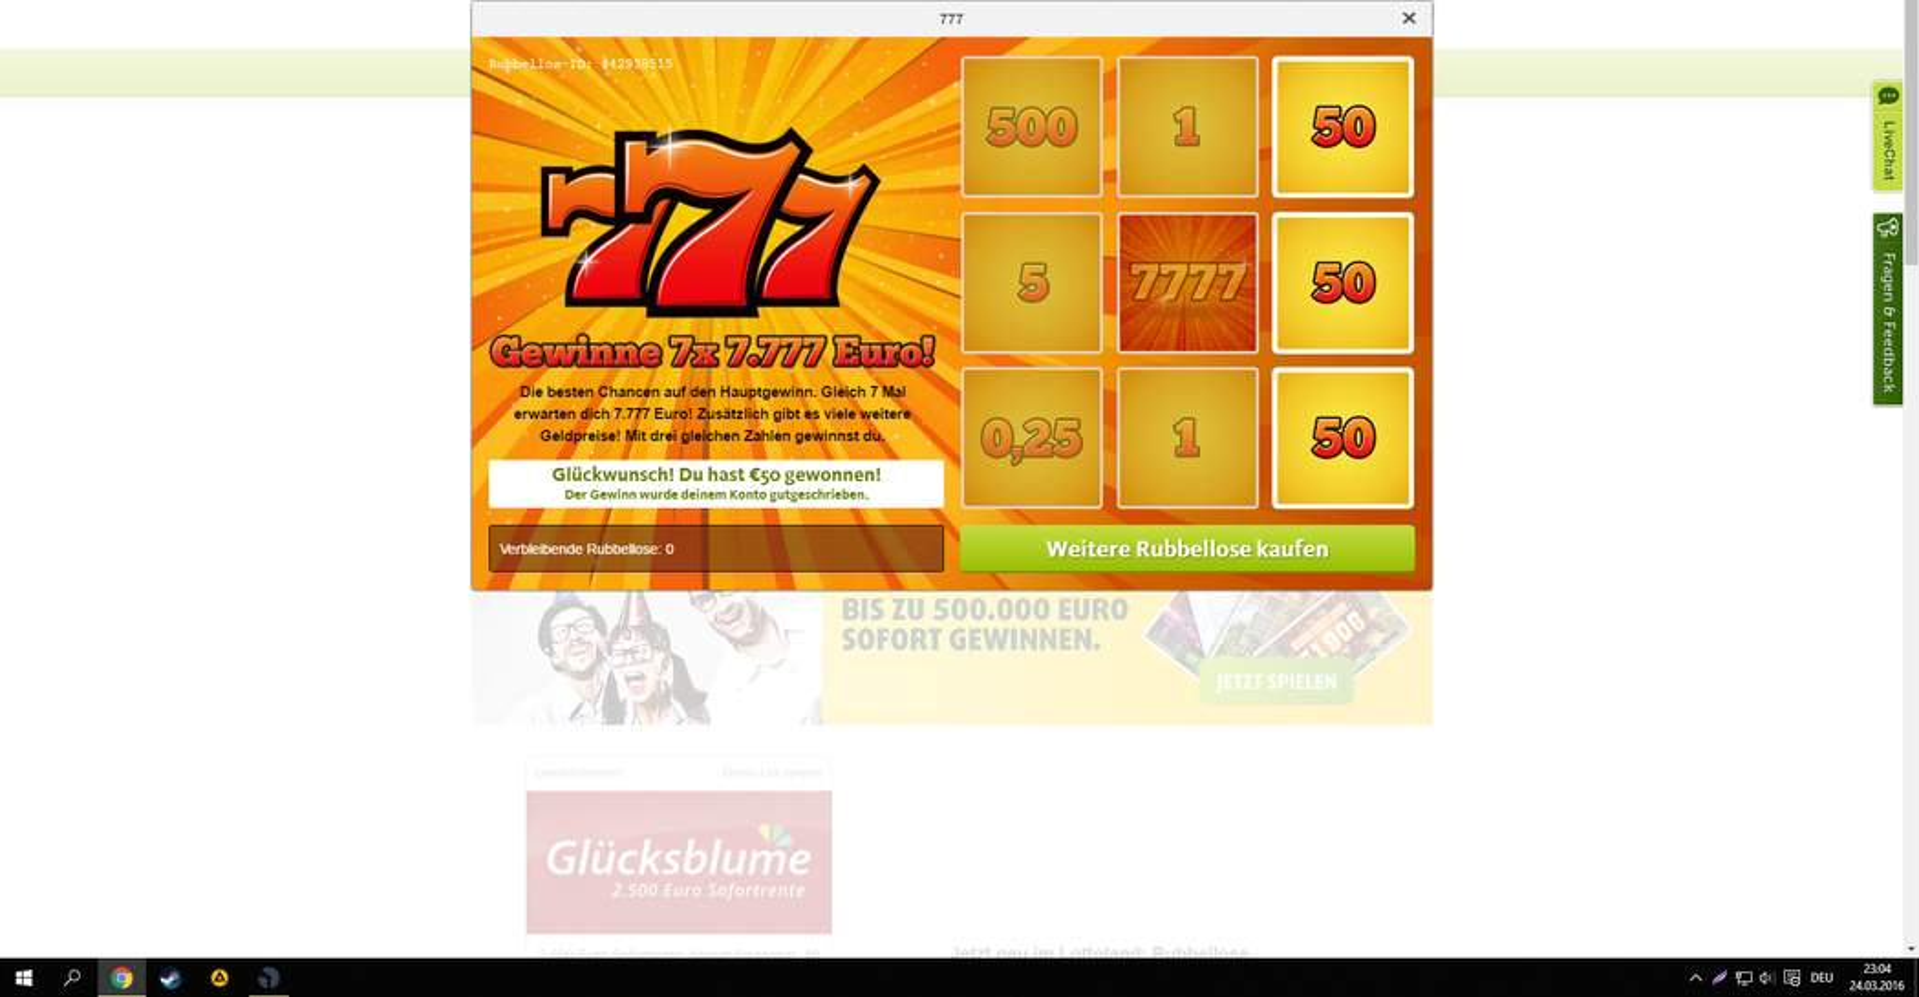 9221271-JyGaI